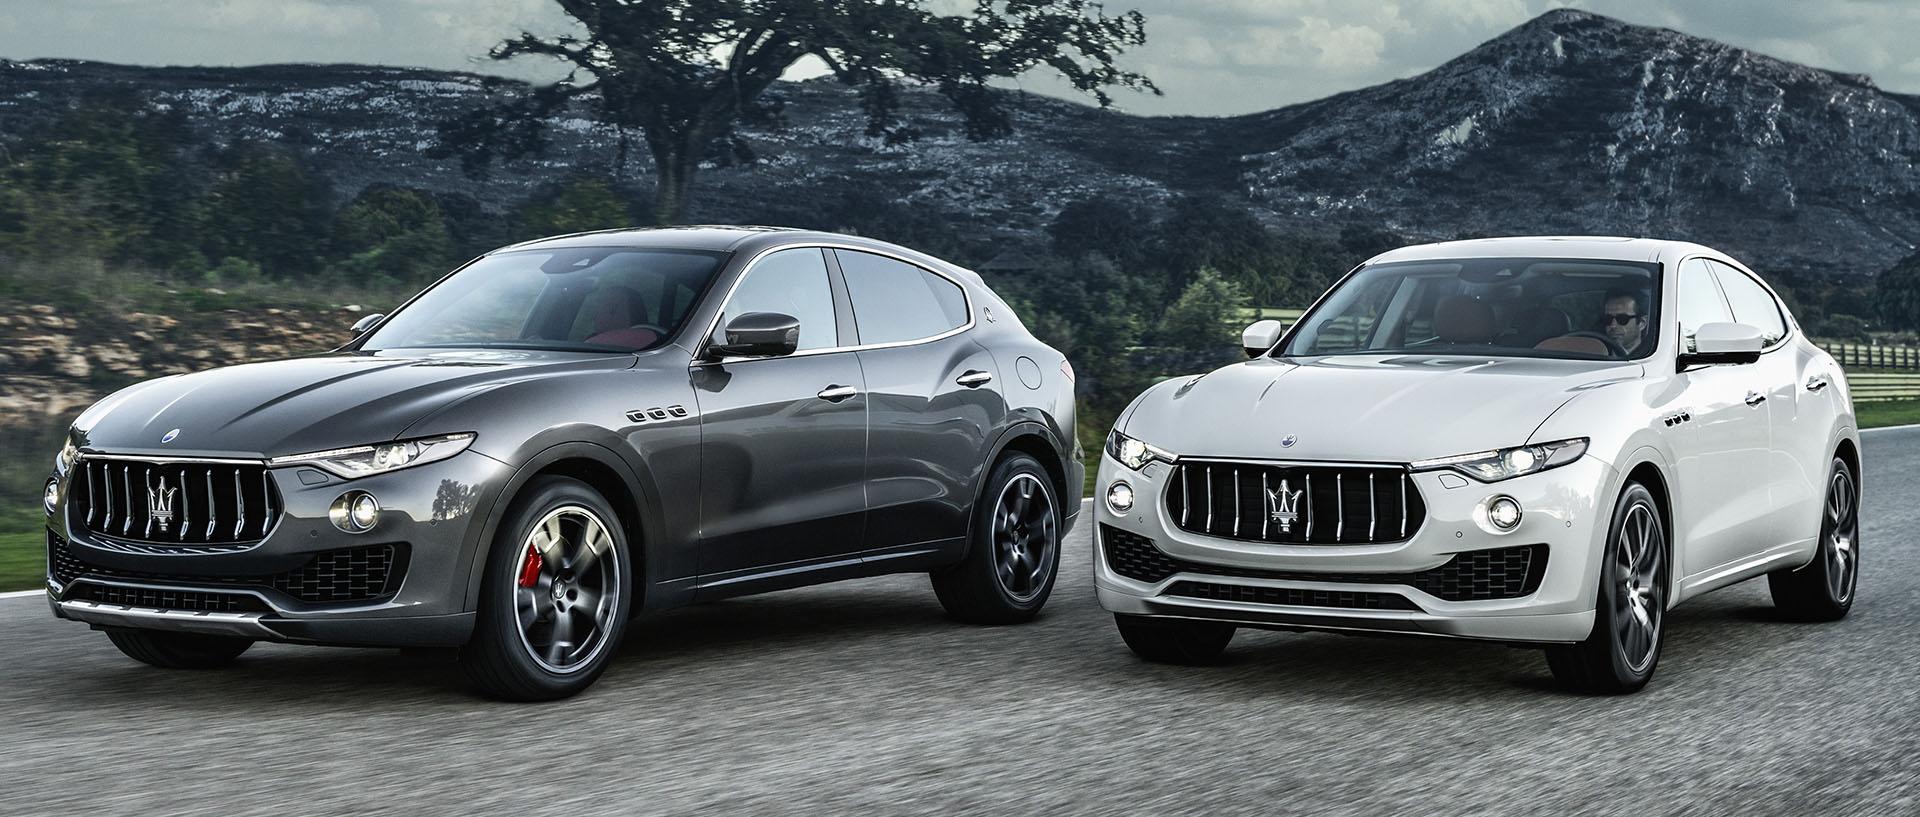 Used Car Batteries >> 2017 Maserati Levante - Consumer Reports